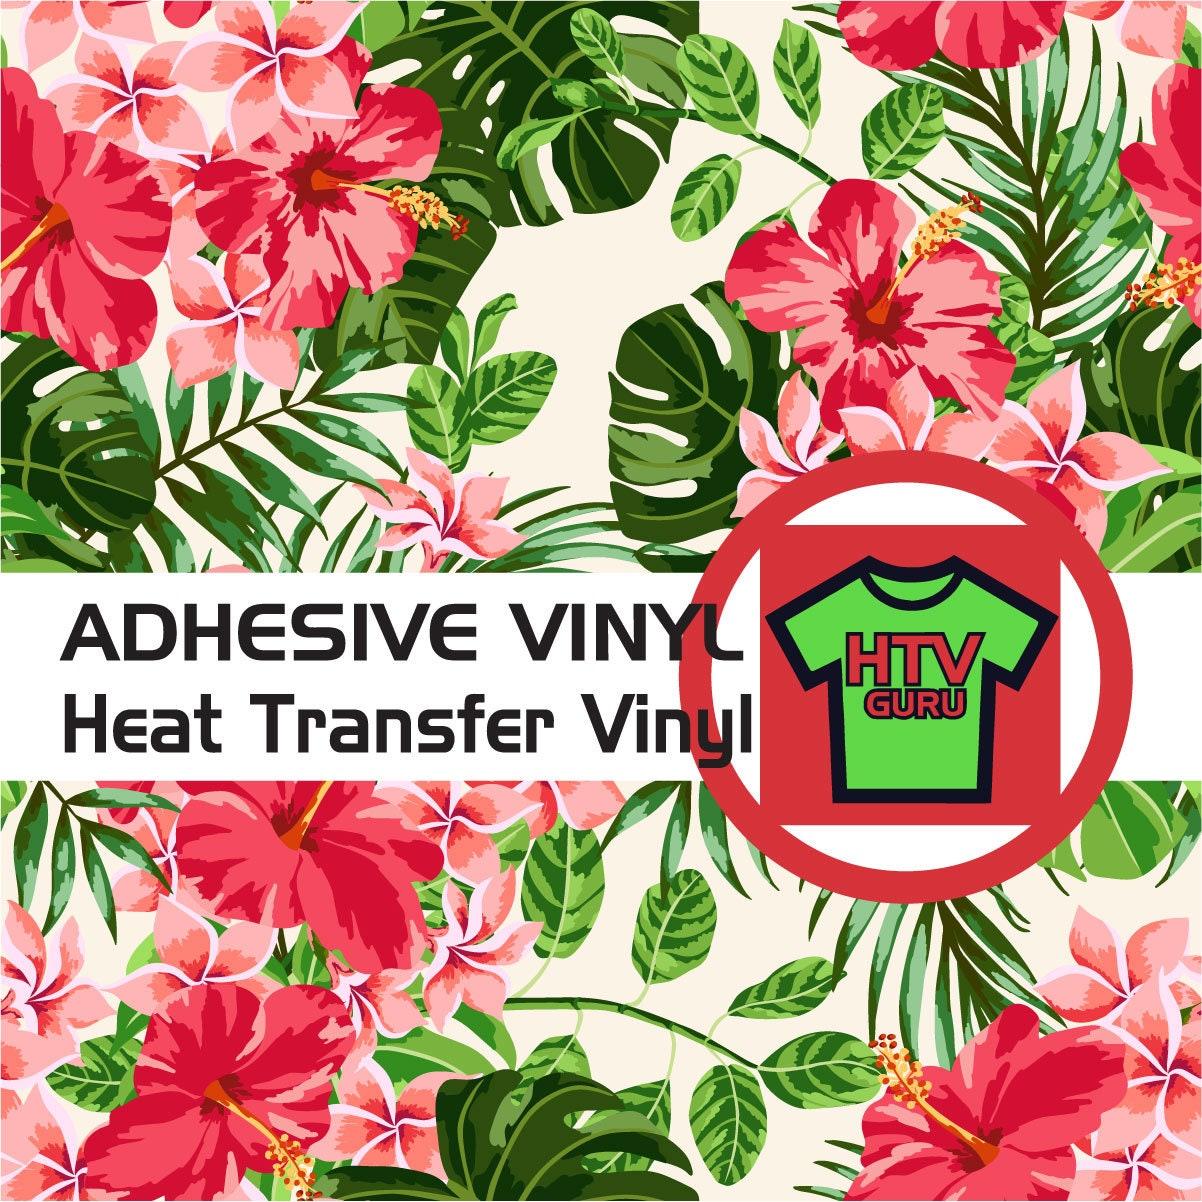 Oracal Adhesive Vinyl L132 Glitter HTV Tropical Floral Flower Printed Vinyl Patterned Iron on Vinyl Siser Heat Transfer Vinyl